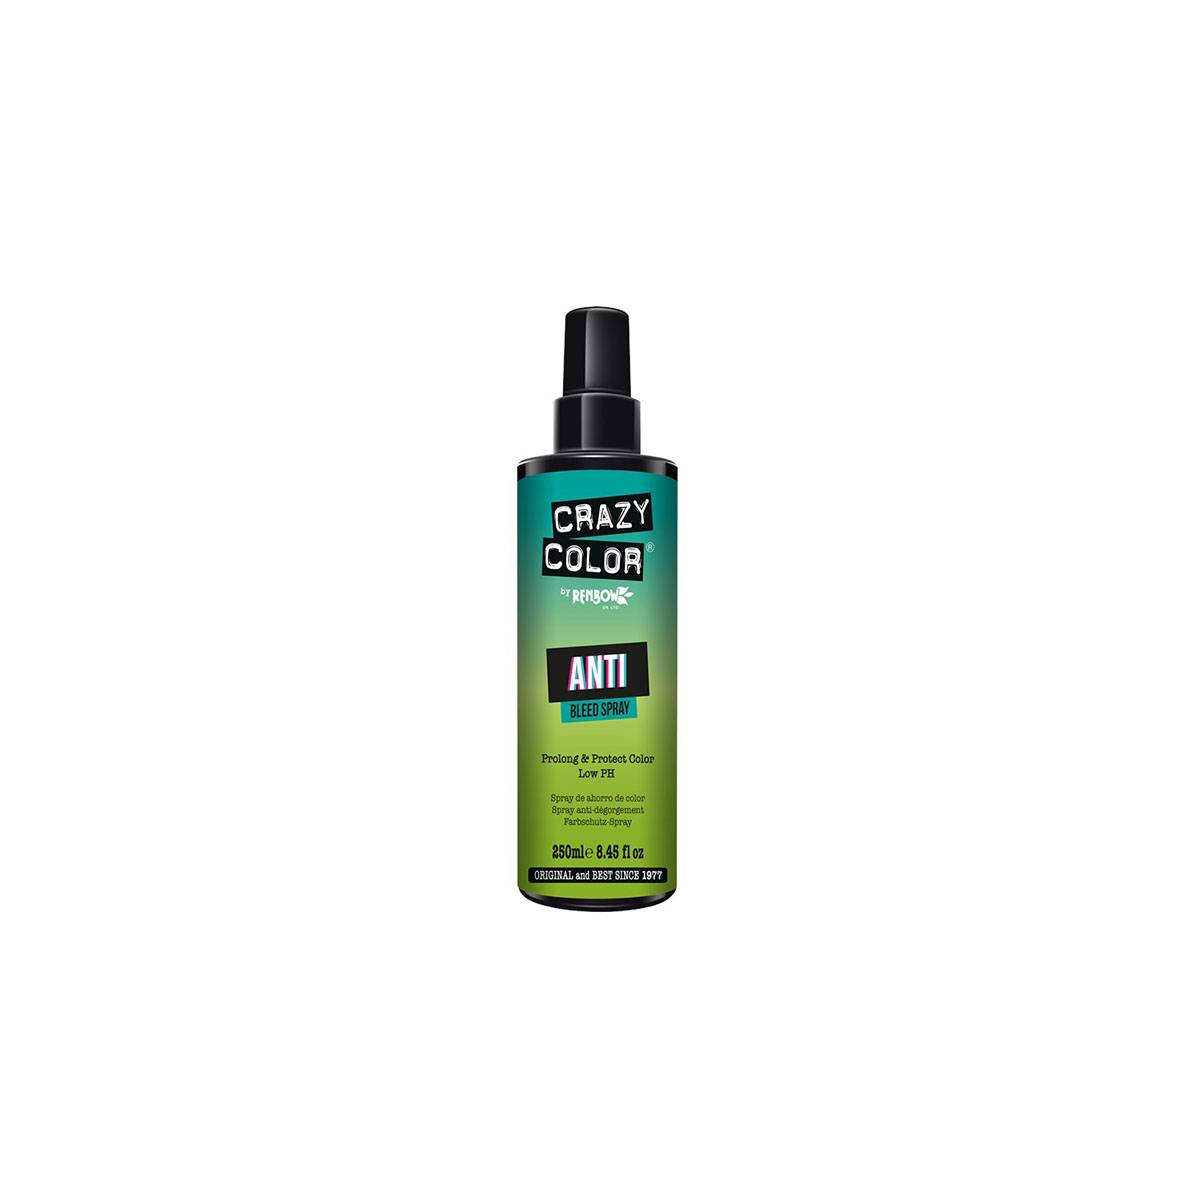 Crazy Color Anti Bleed Spray 250ml*cat